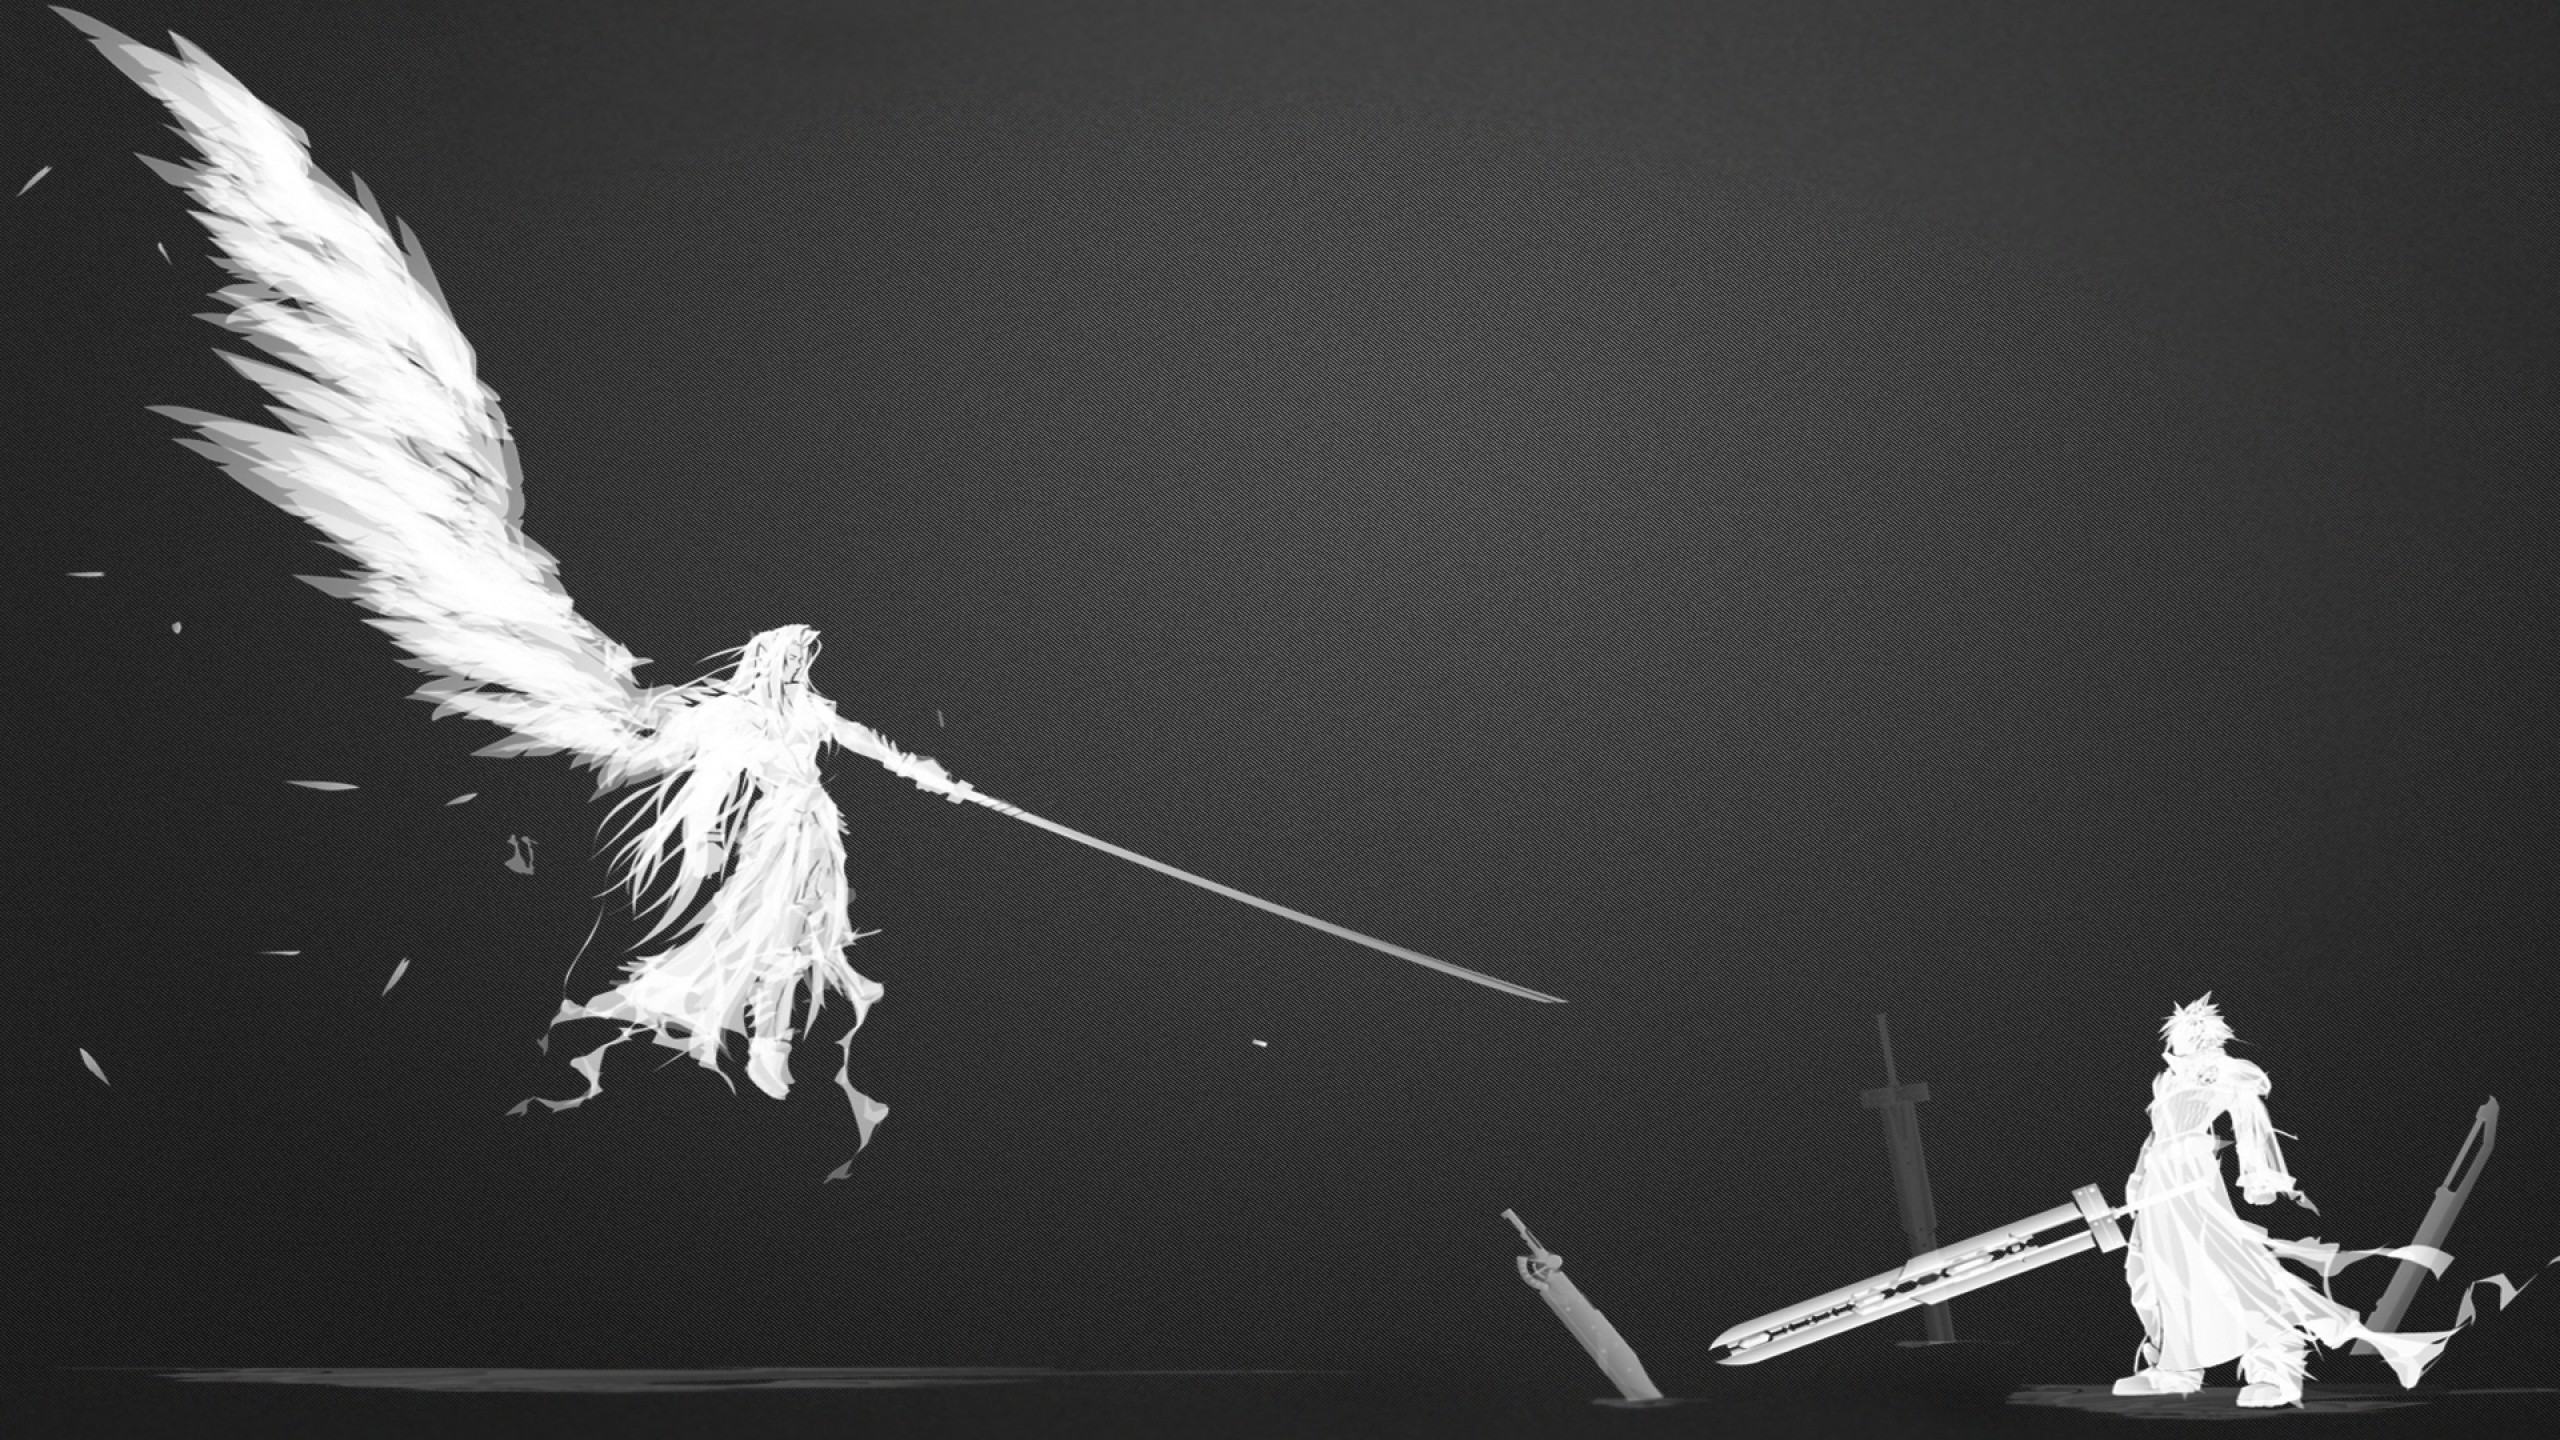 Tidus | Tidus & Yuna – Final Fantasy X Wallpaper (30859818) – Fanpop  fanclubs | 21 whisperz | Pinterest | Final fantasy, Yuna final fantasy and  Finals